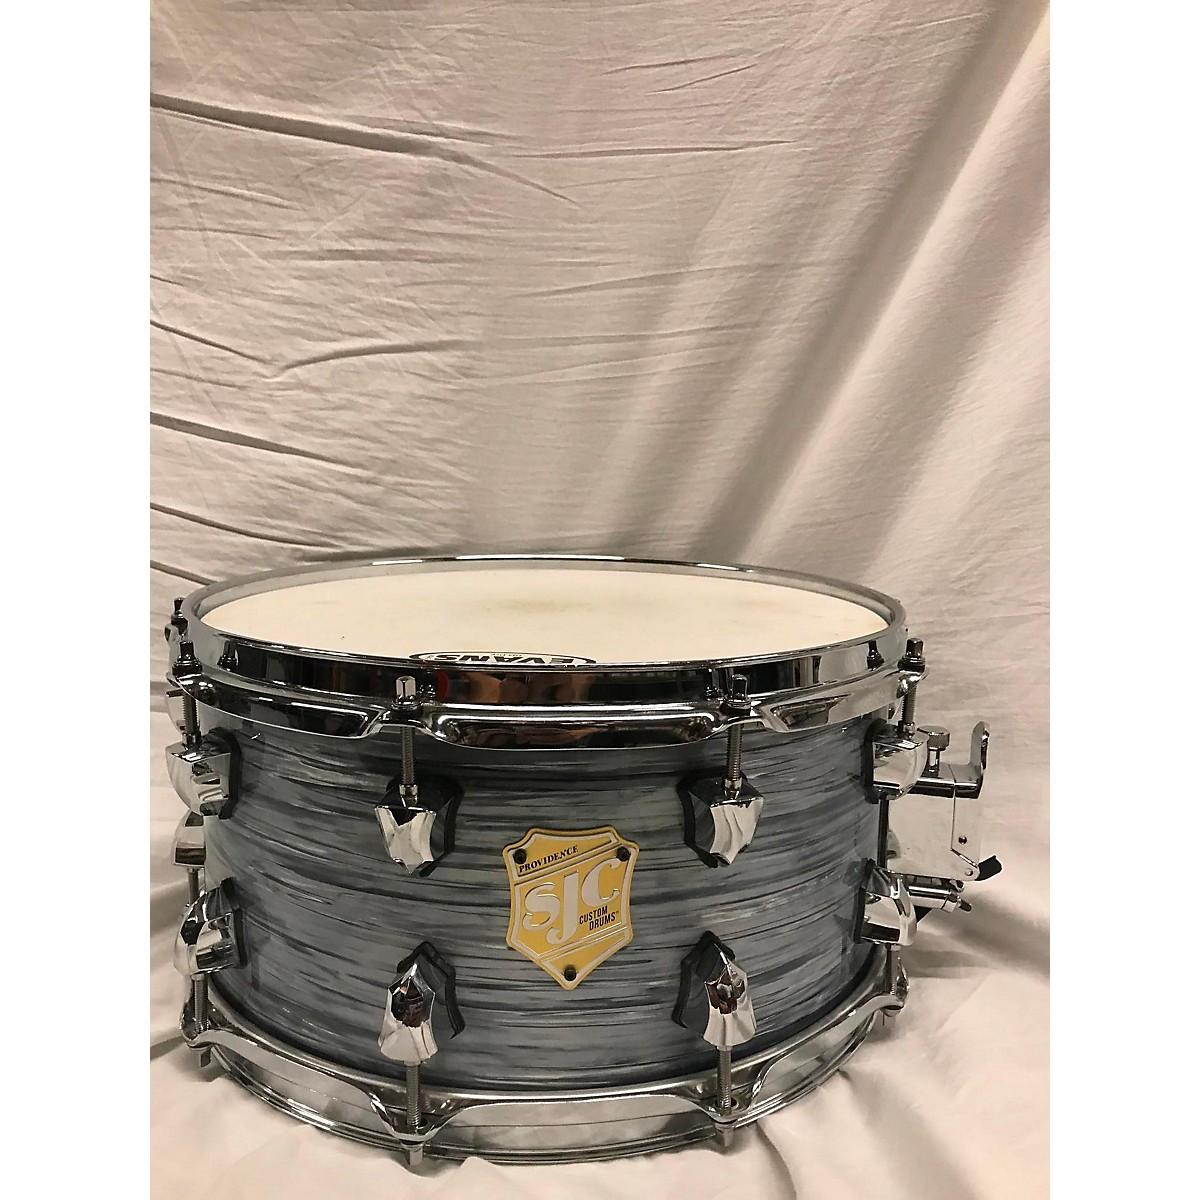 SJC 2010s 7X14 PROVIDENCE Drum